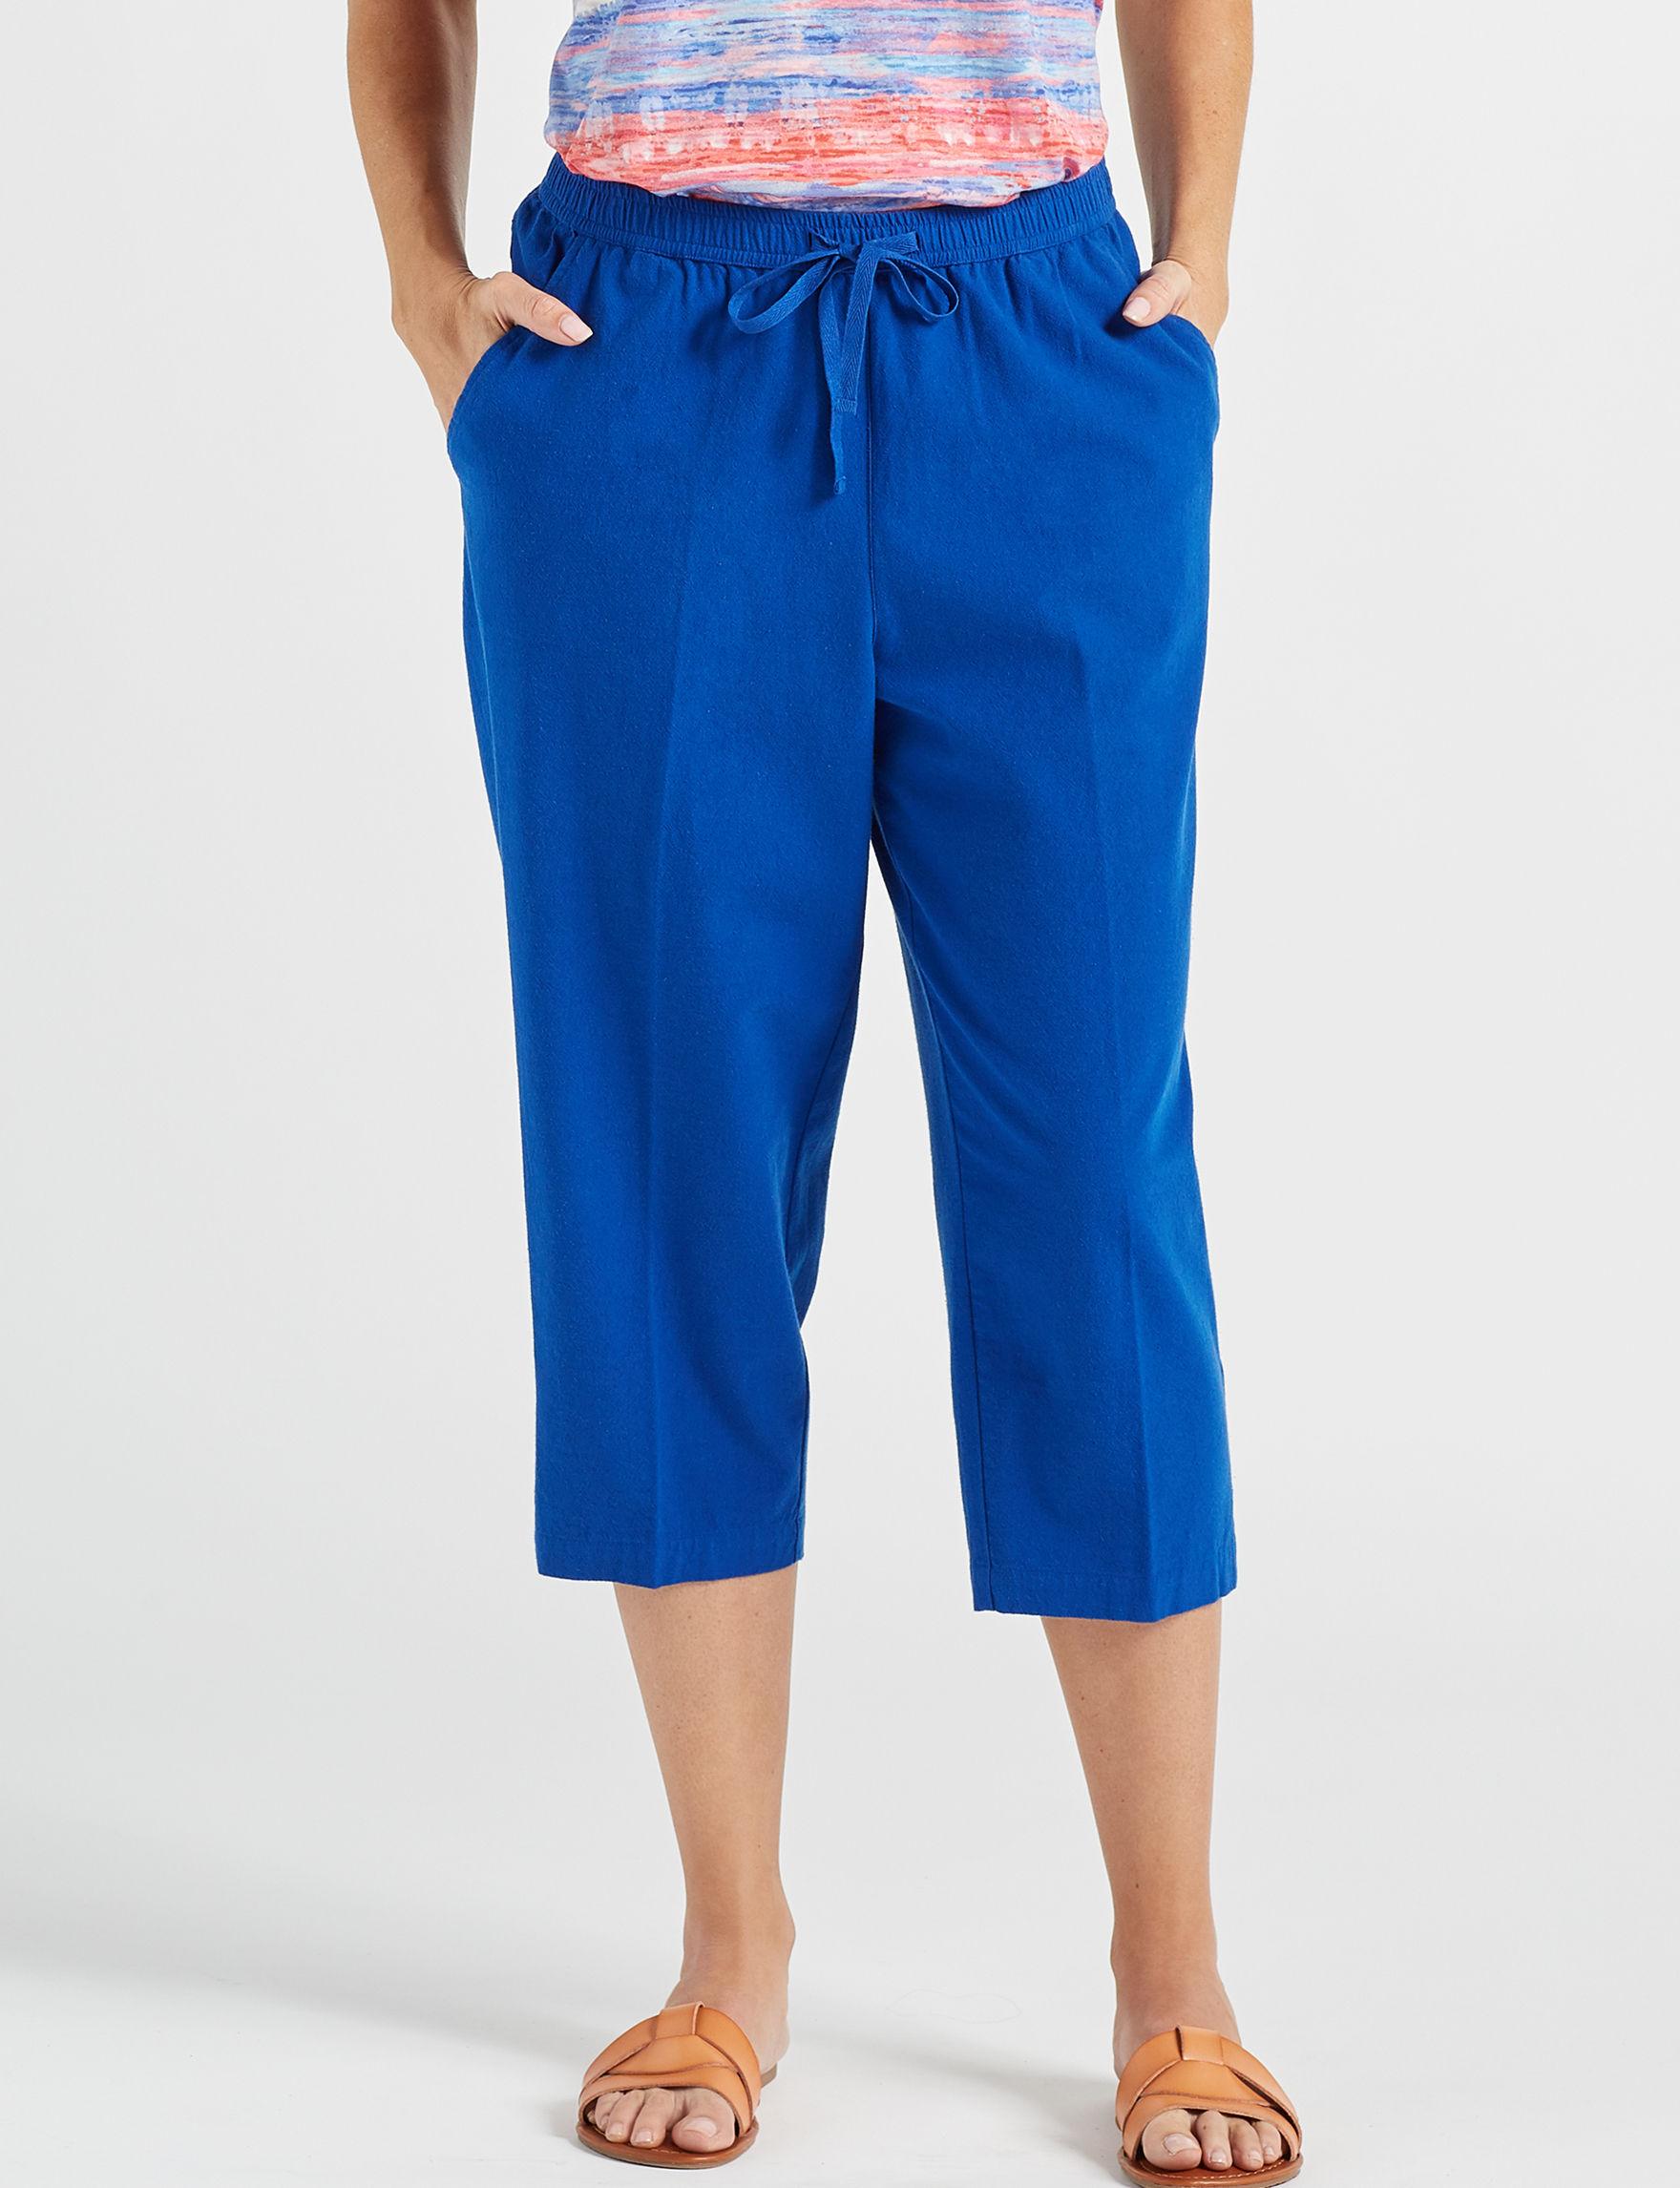 Cathy Daniels Royal Blue Capris & Crops